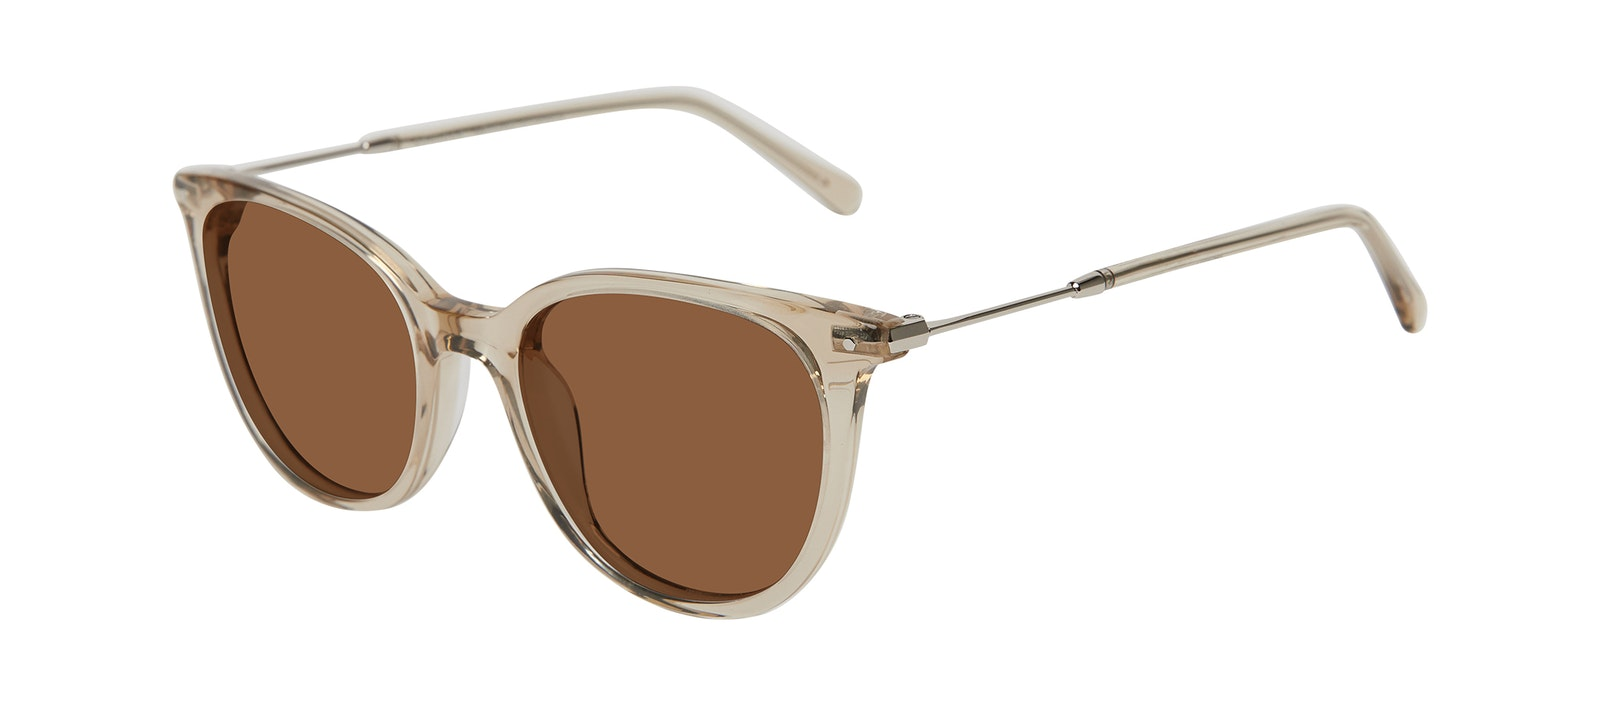 Affordable Fashion Glasses Square Sunglasses Women Wordly Olive Tilt